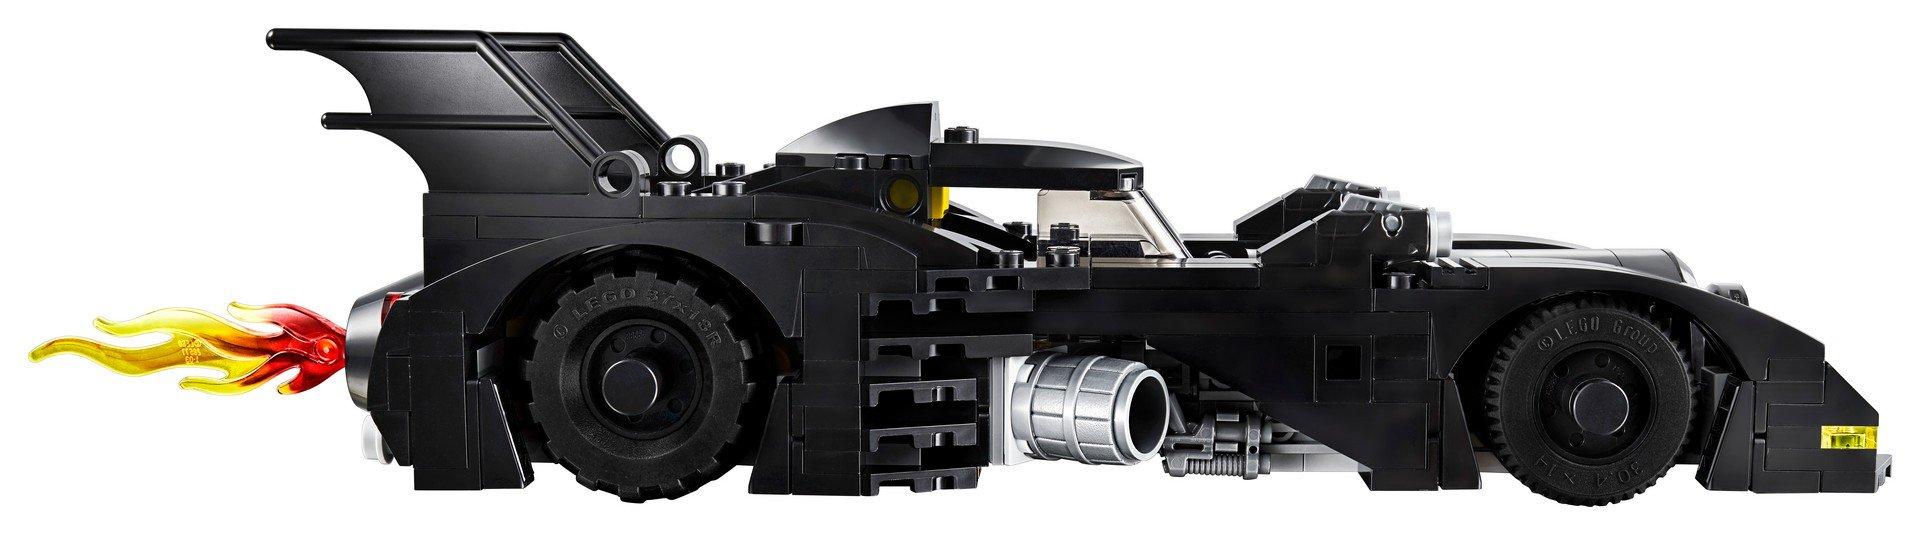 Lego-Batmobile-kit-1989-6